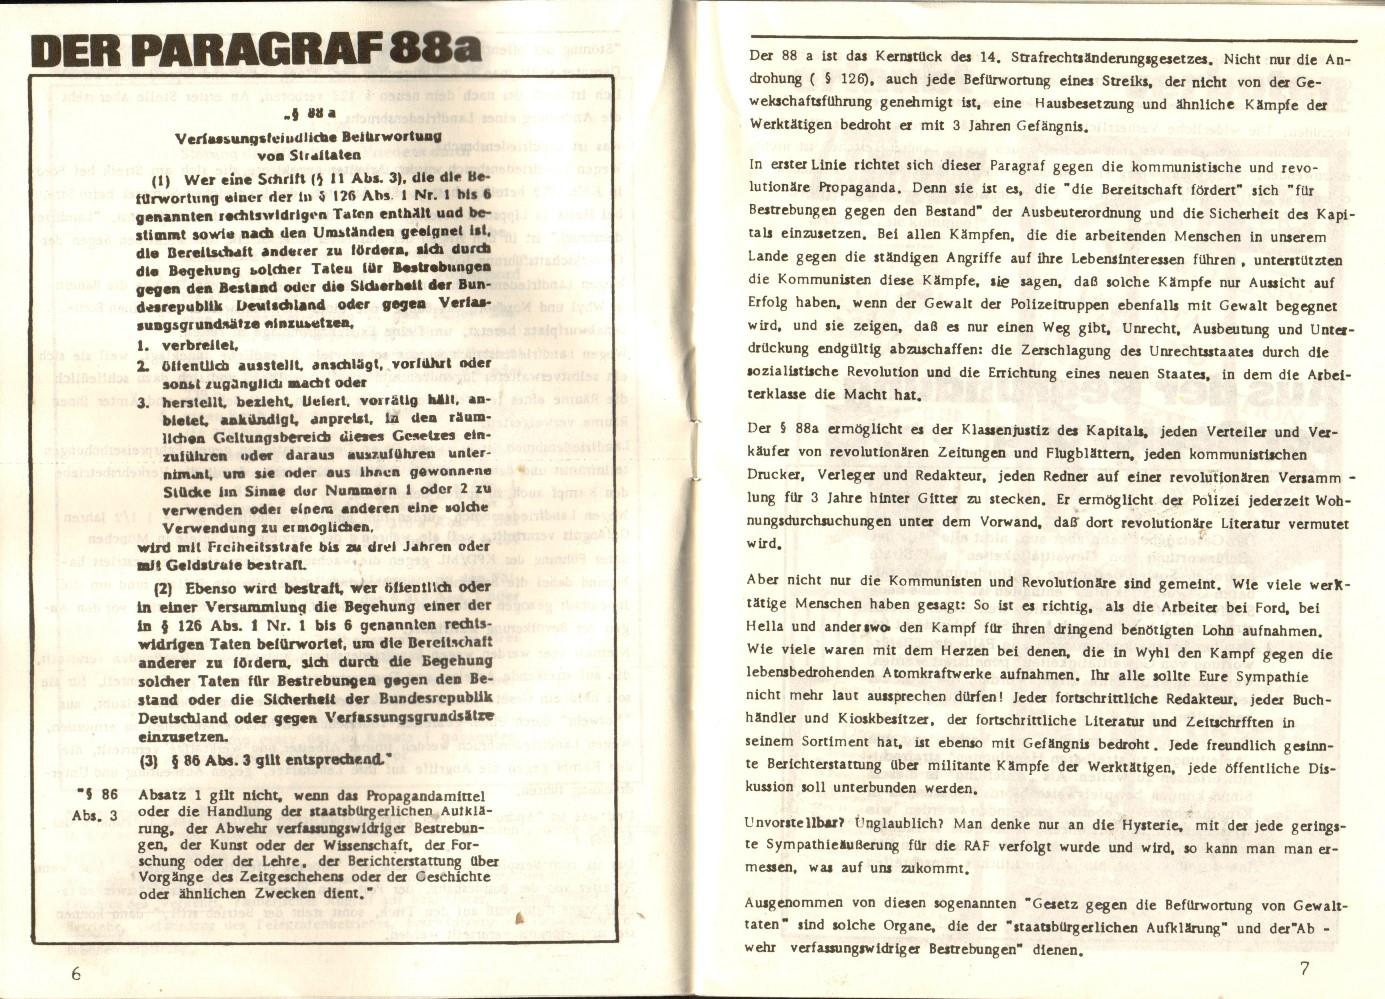 RHD_1976_Doku_Strafrechtsaenderungsgesetz_04